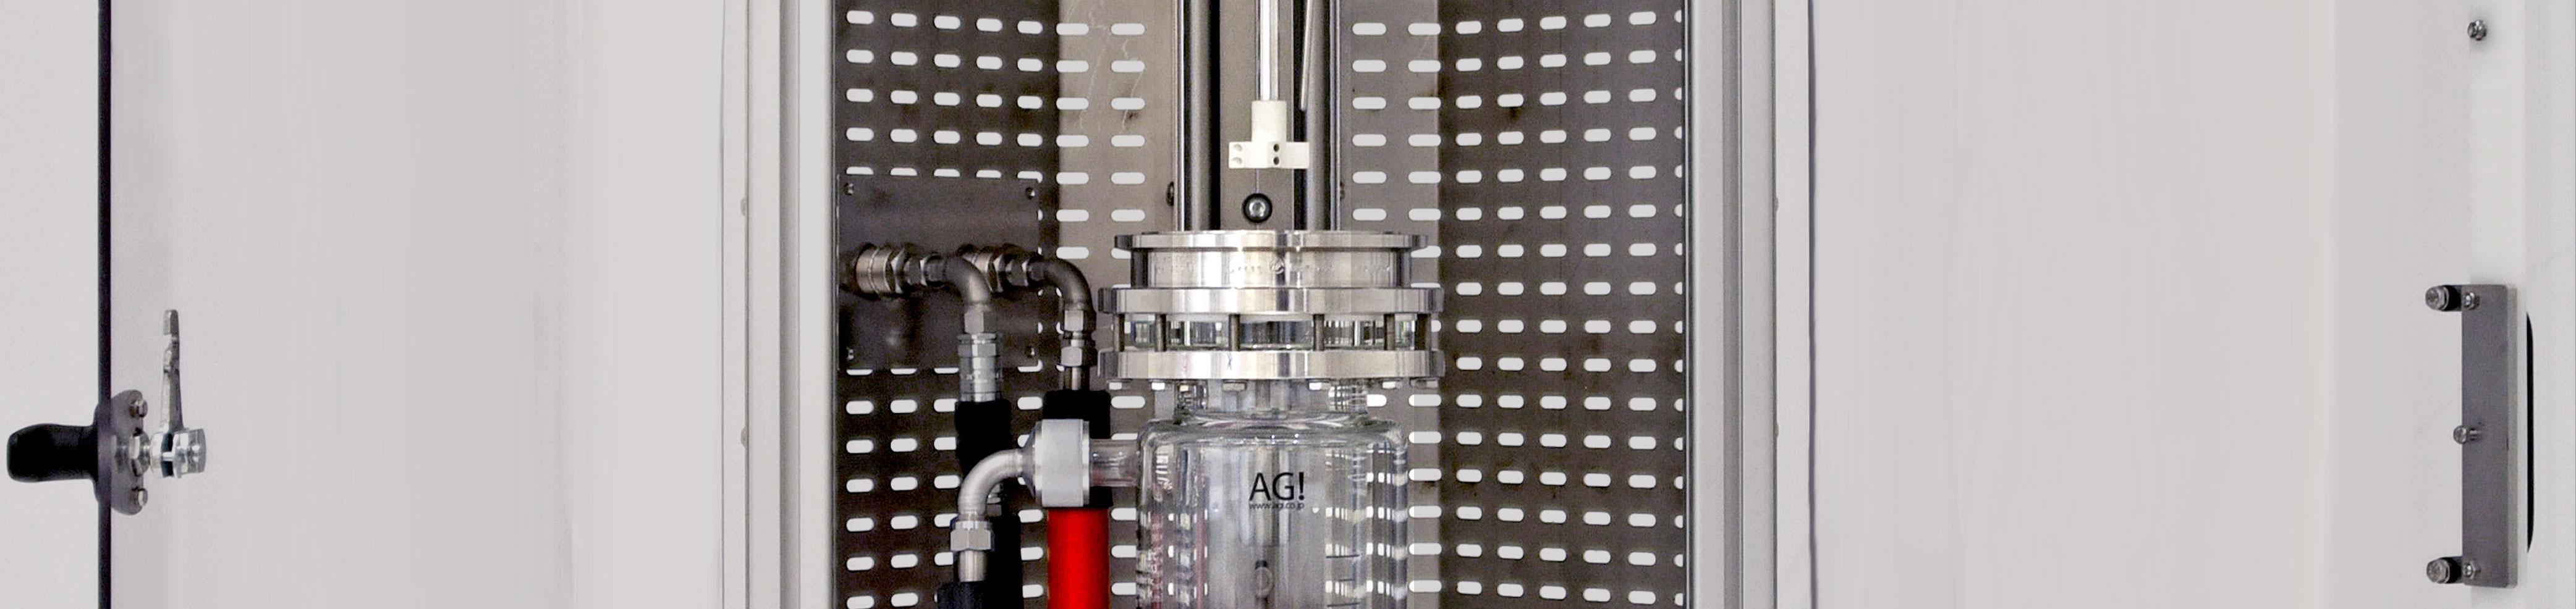 AGI Glassplant Pressure Reactor